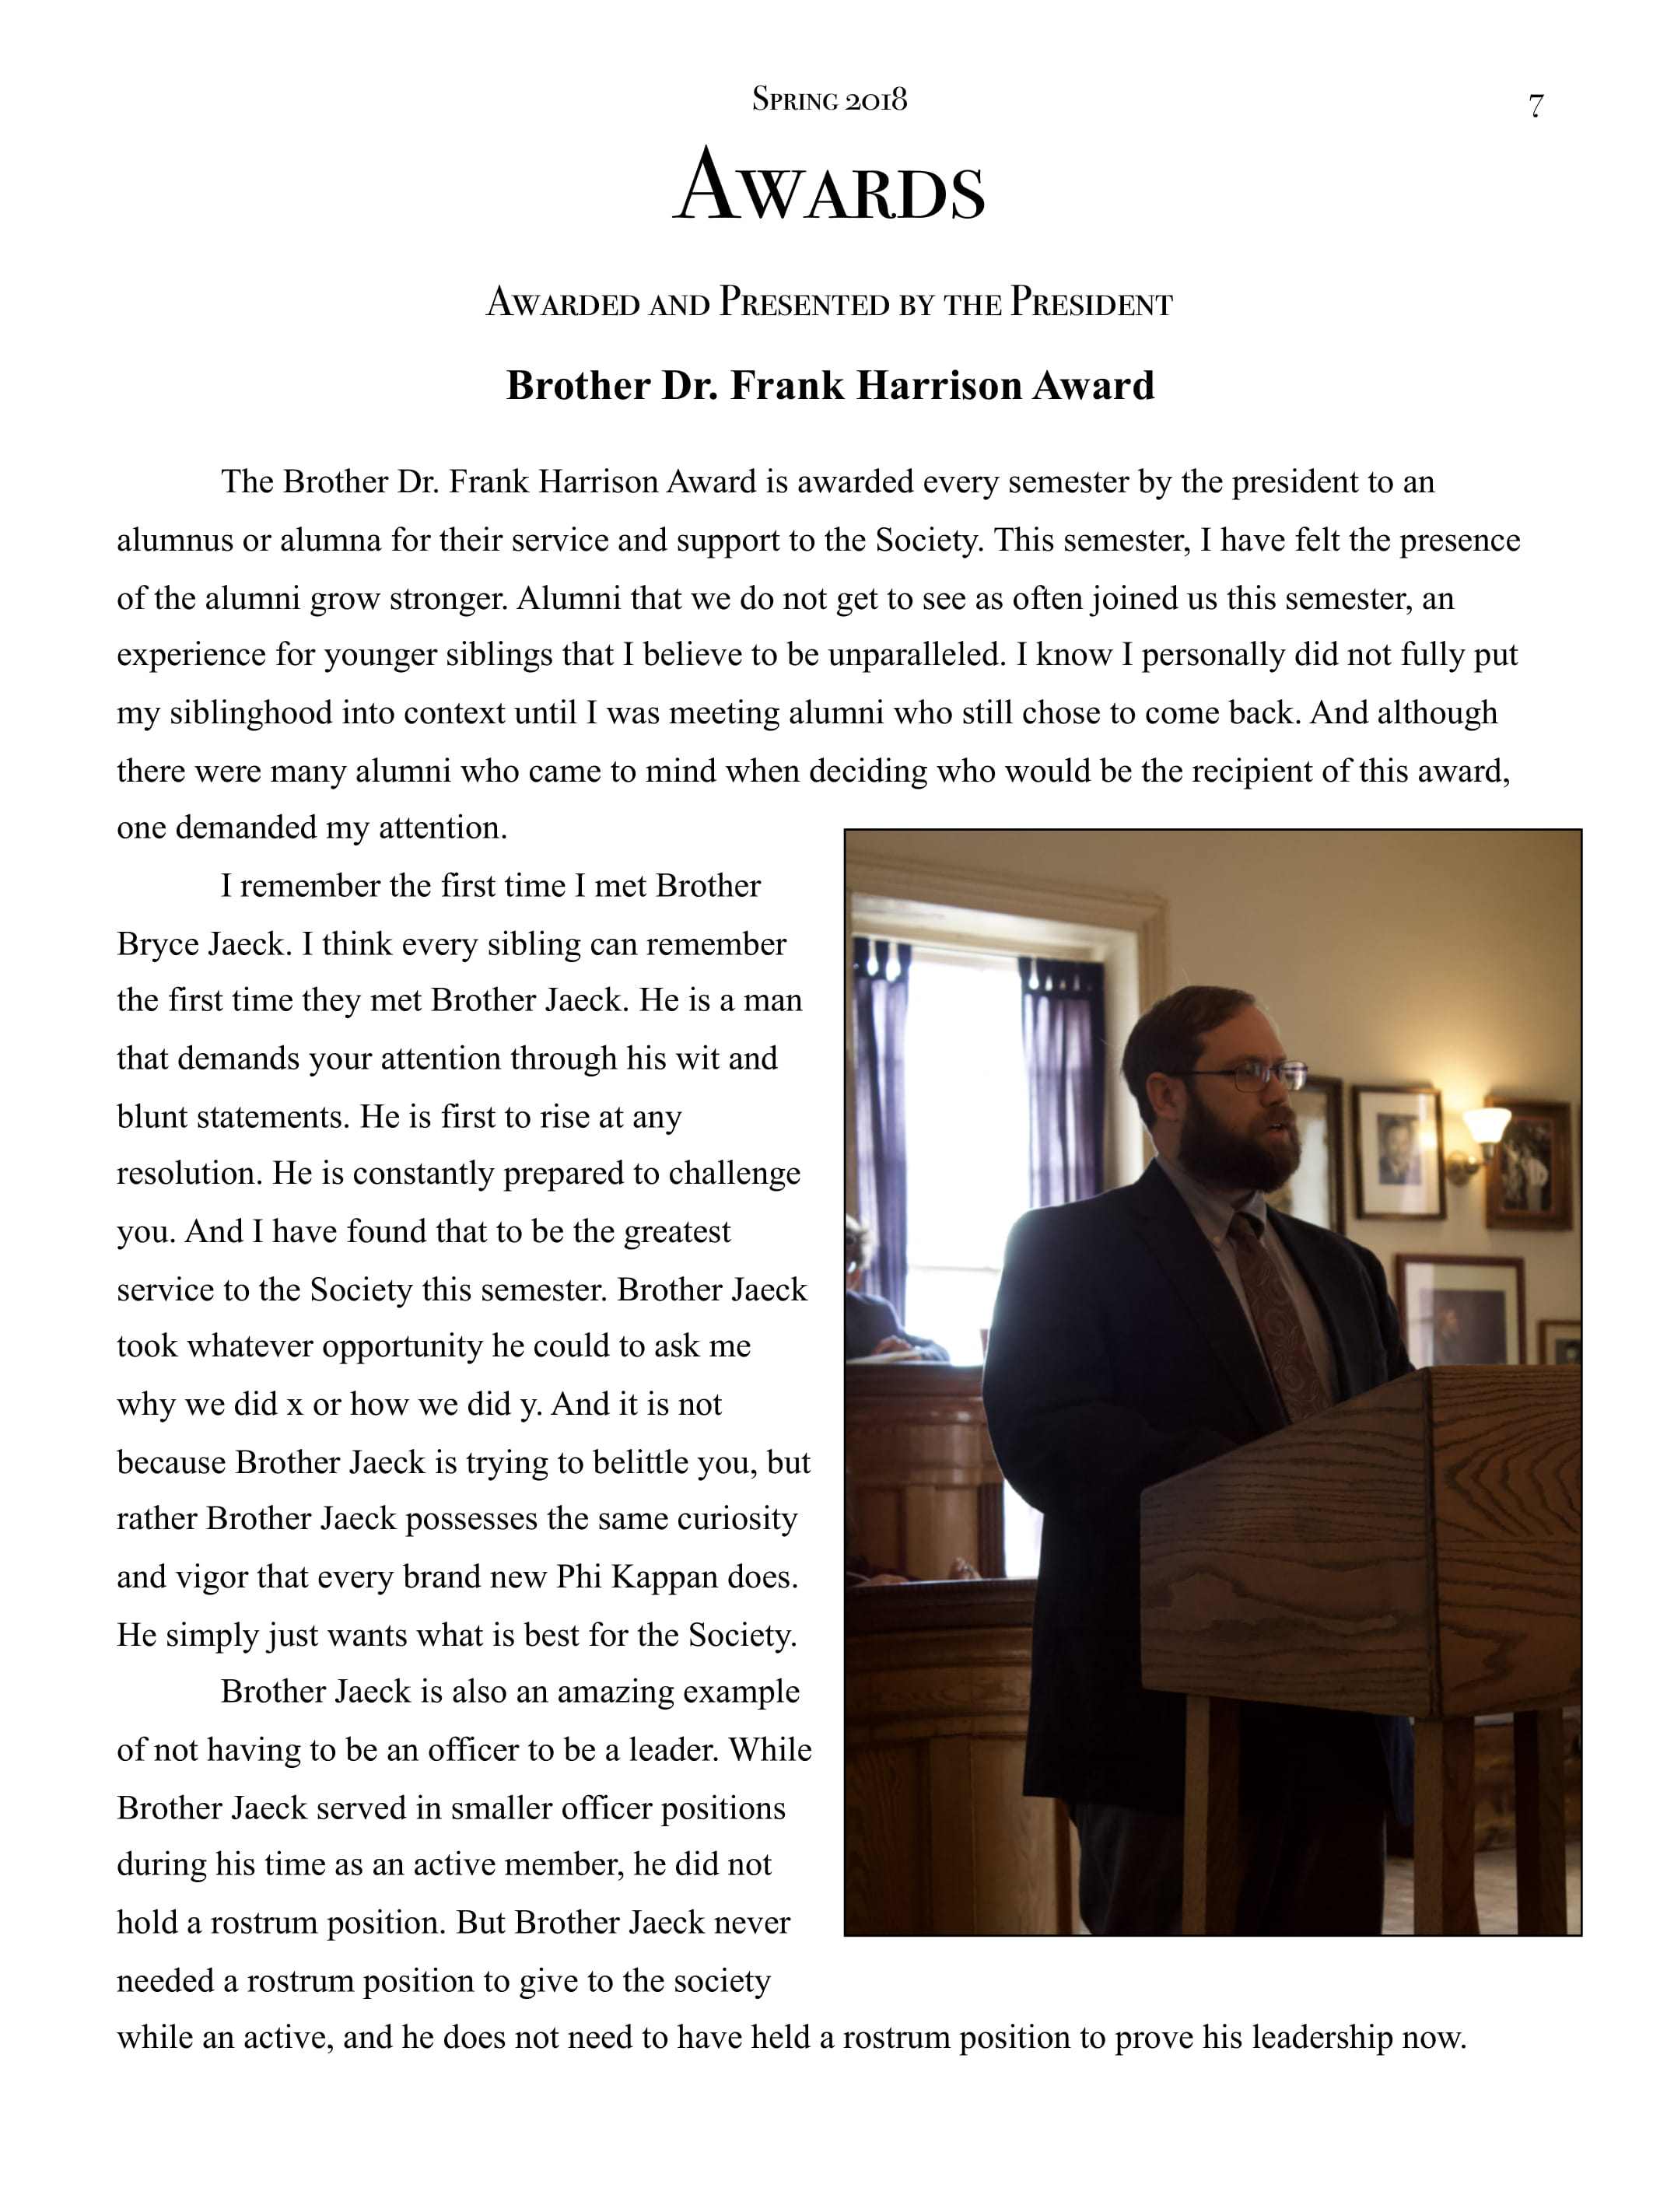 The Orator 2 - Spring 2018-07.jpg